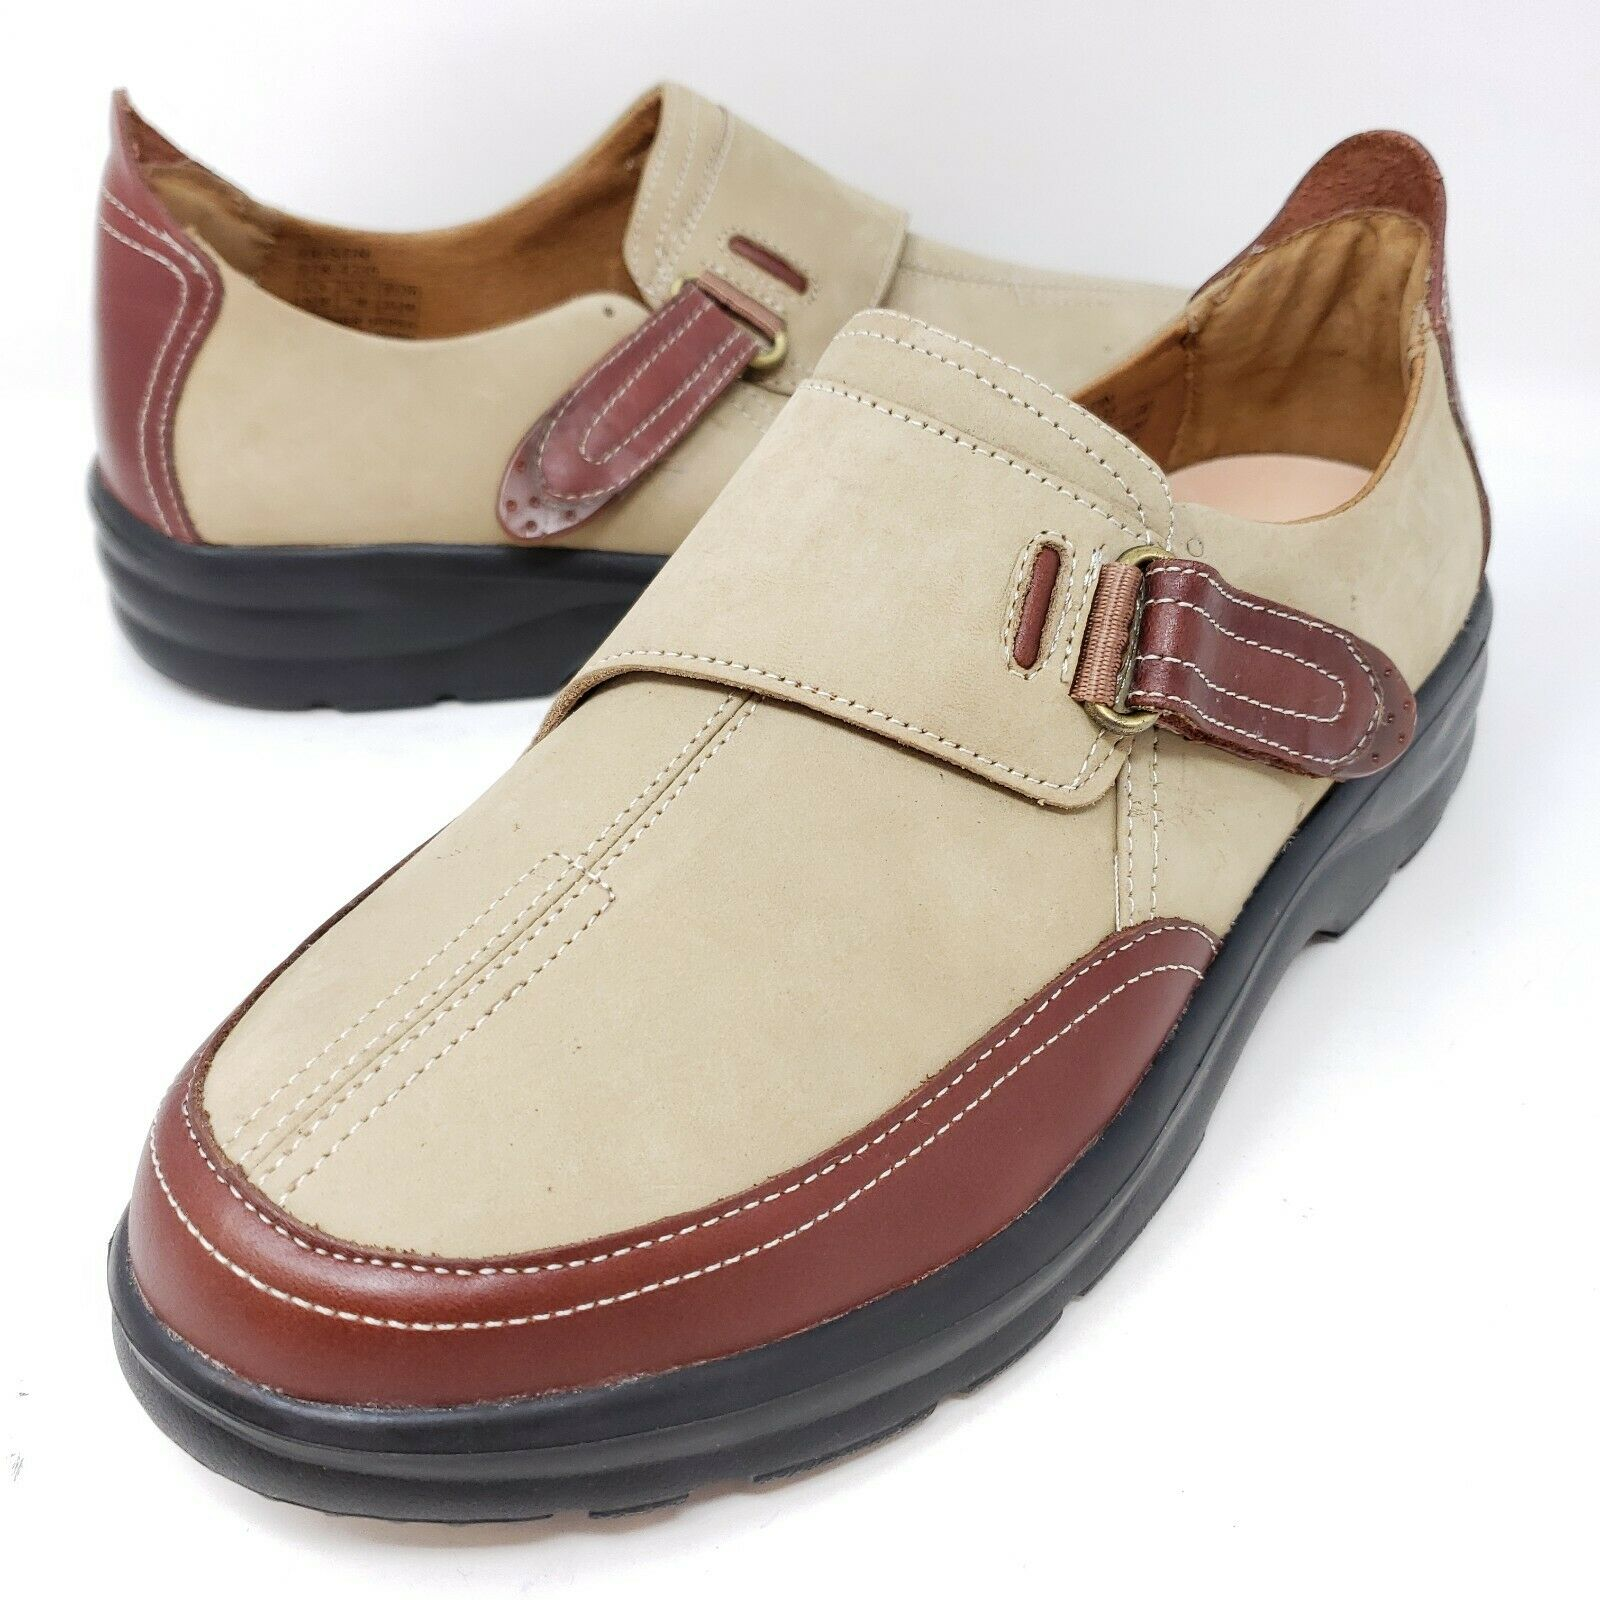 Dr Comfort Kristin Women's Diabetic Shoes Sz 9.5 M Brown Tan Slip On Comfort